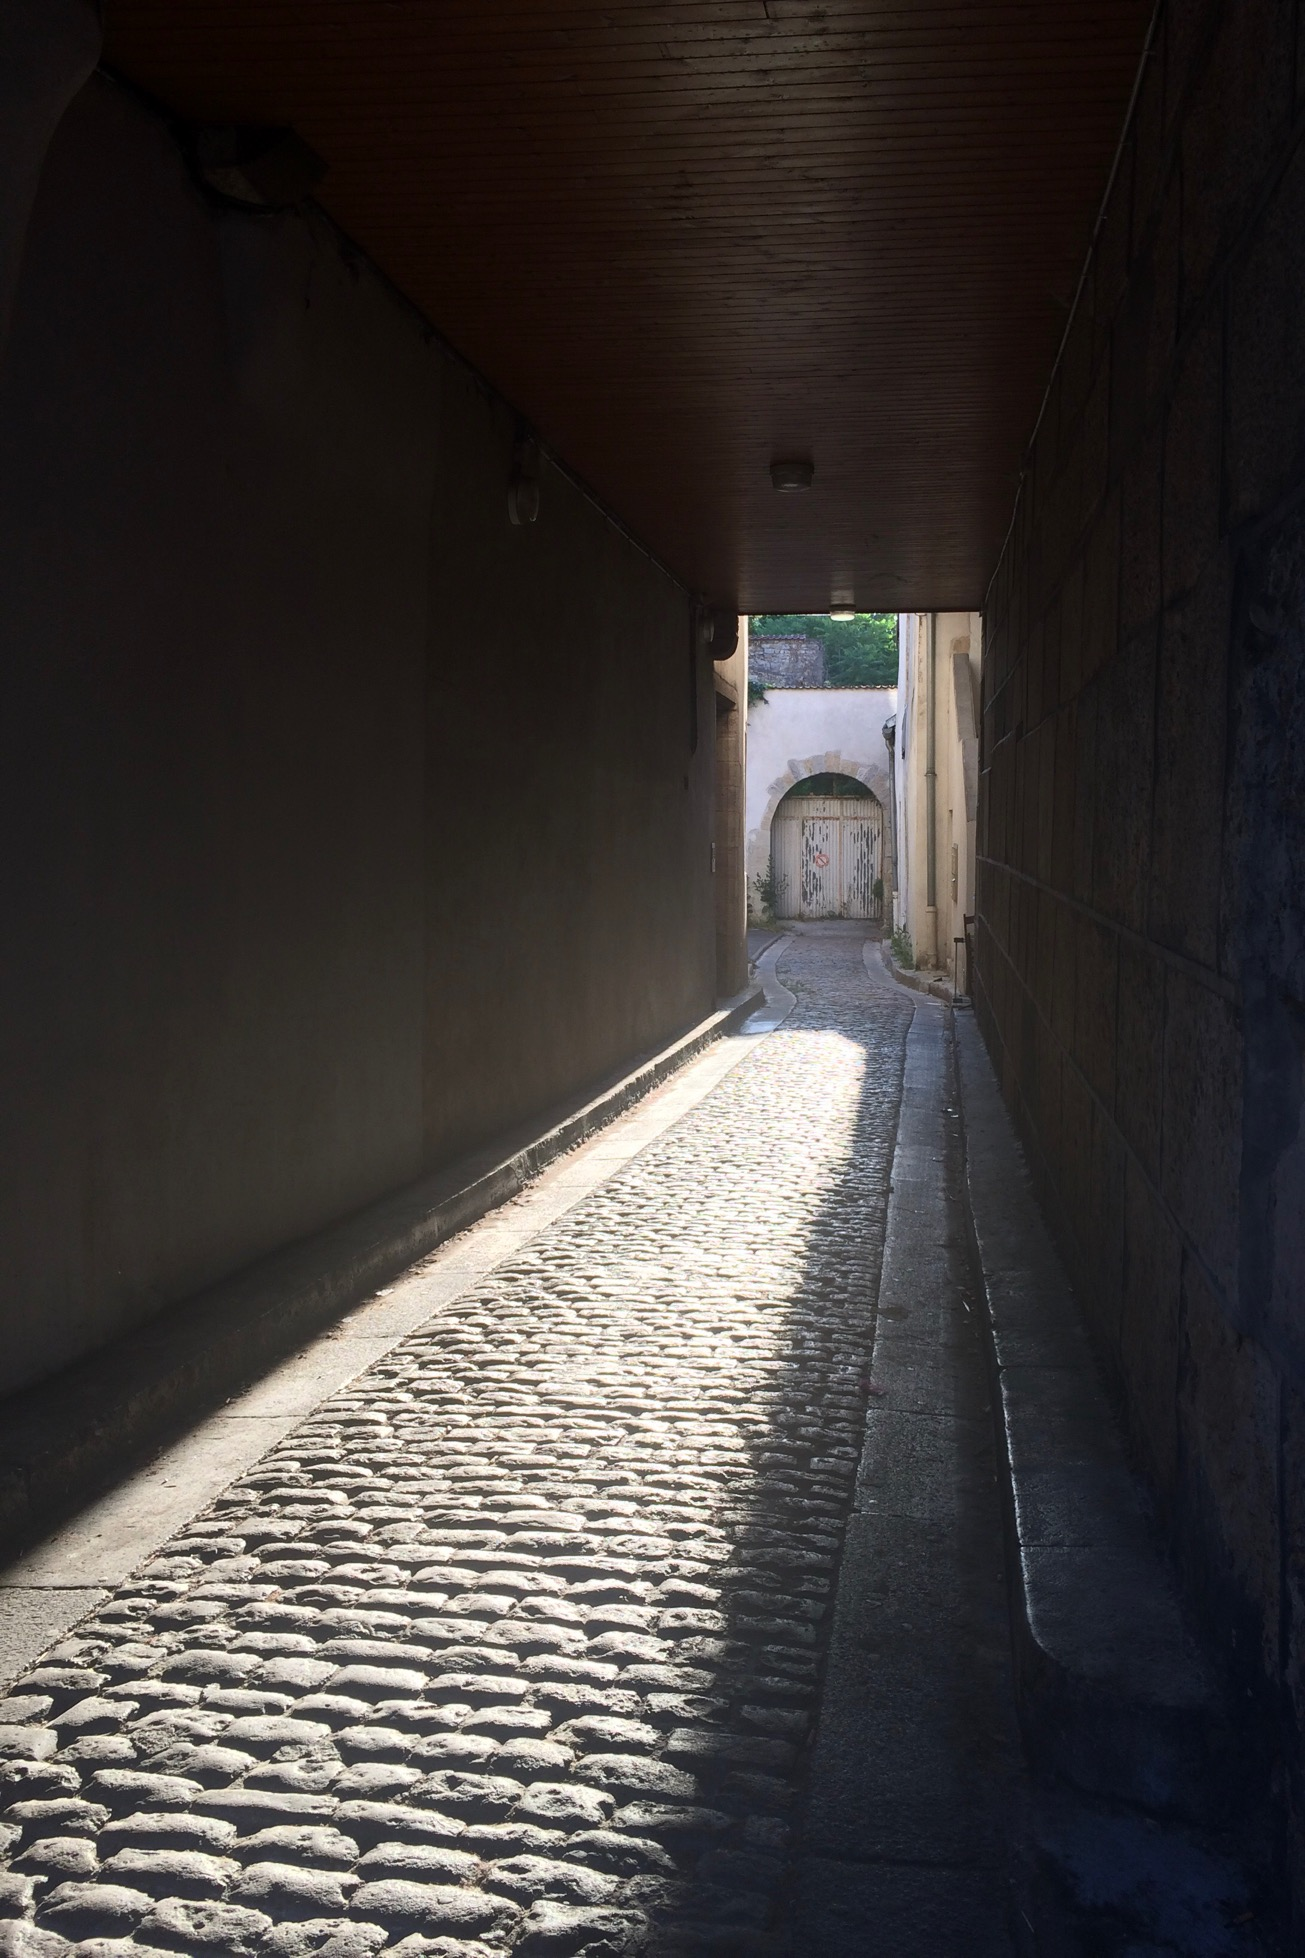 Alleyway, Dijon, France